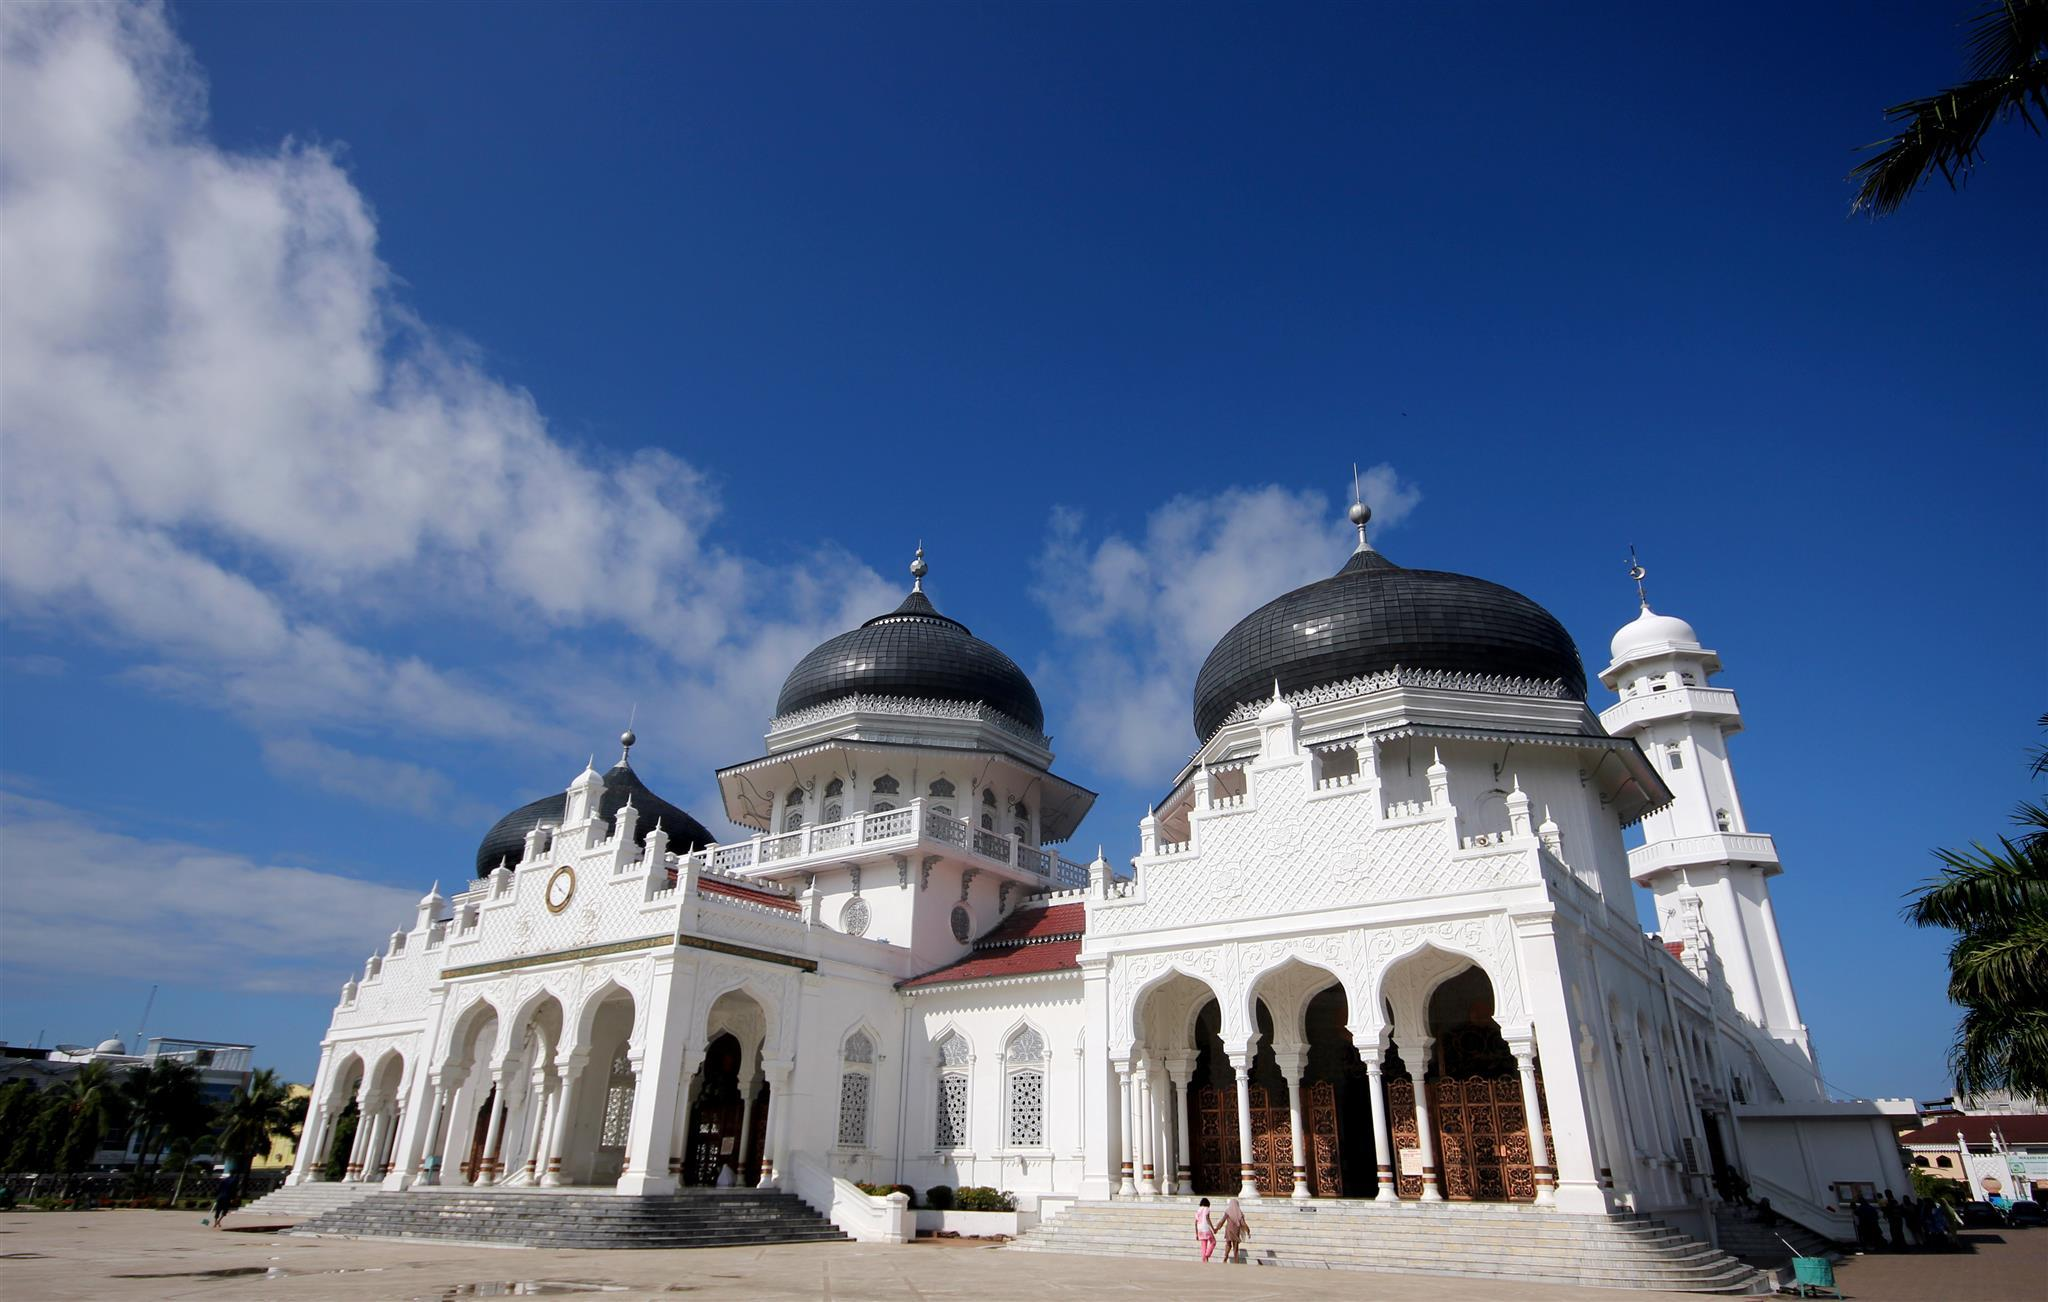 RedDoorz Syariah near Baiturrahman Aceh, Banda Aceh